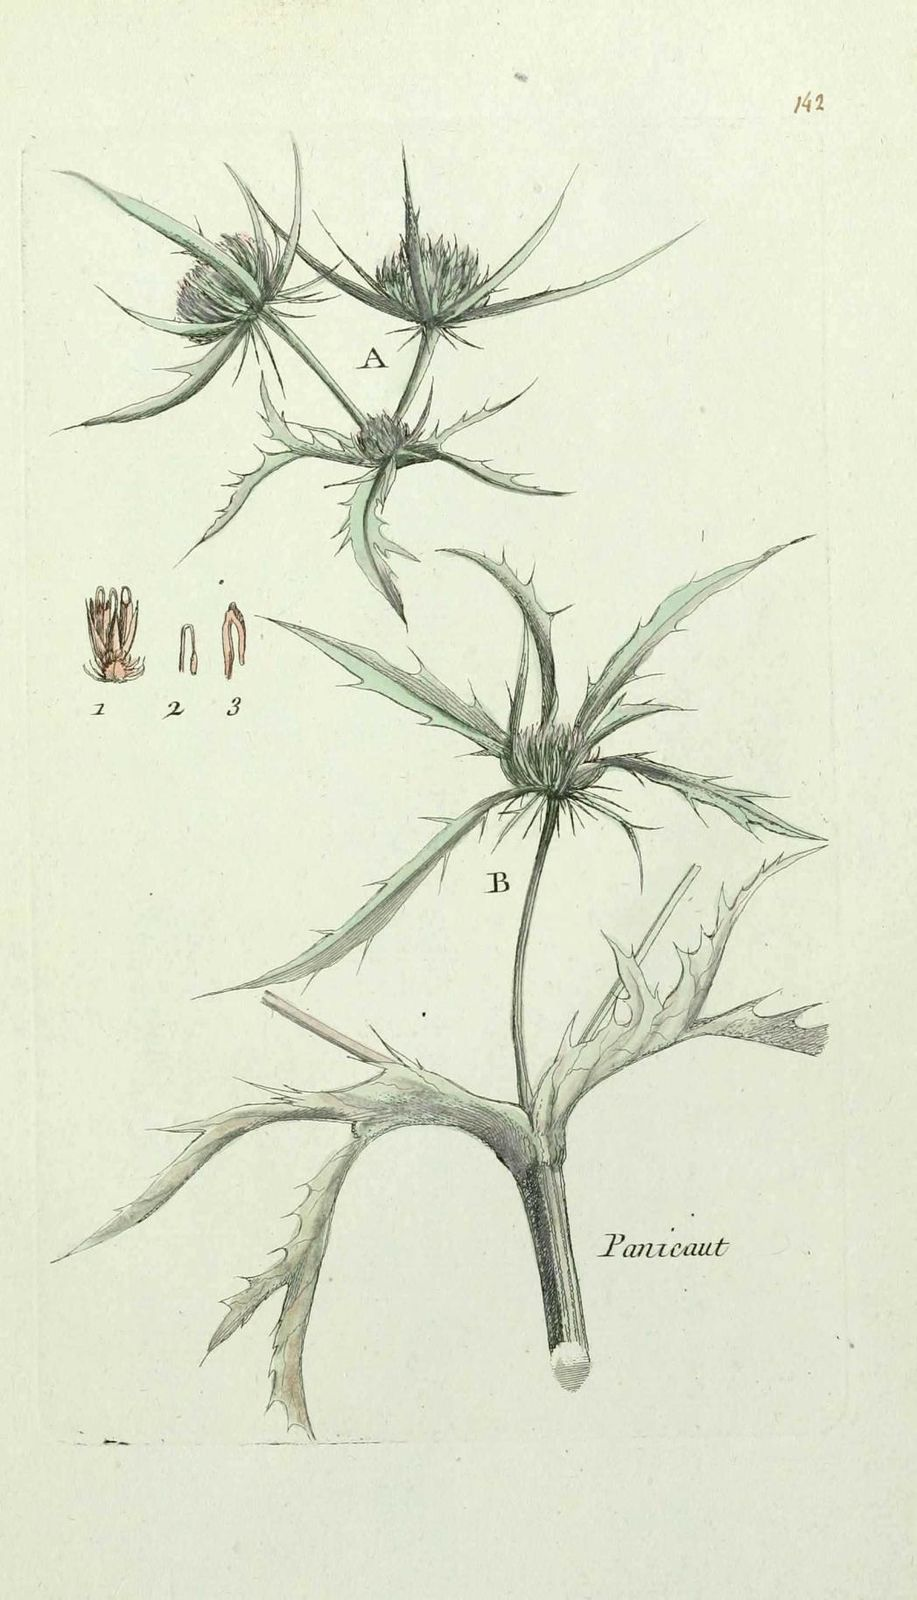 panicaut - eryngium campestre ( chardon roland, herbe a cen